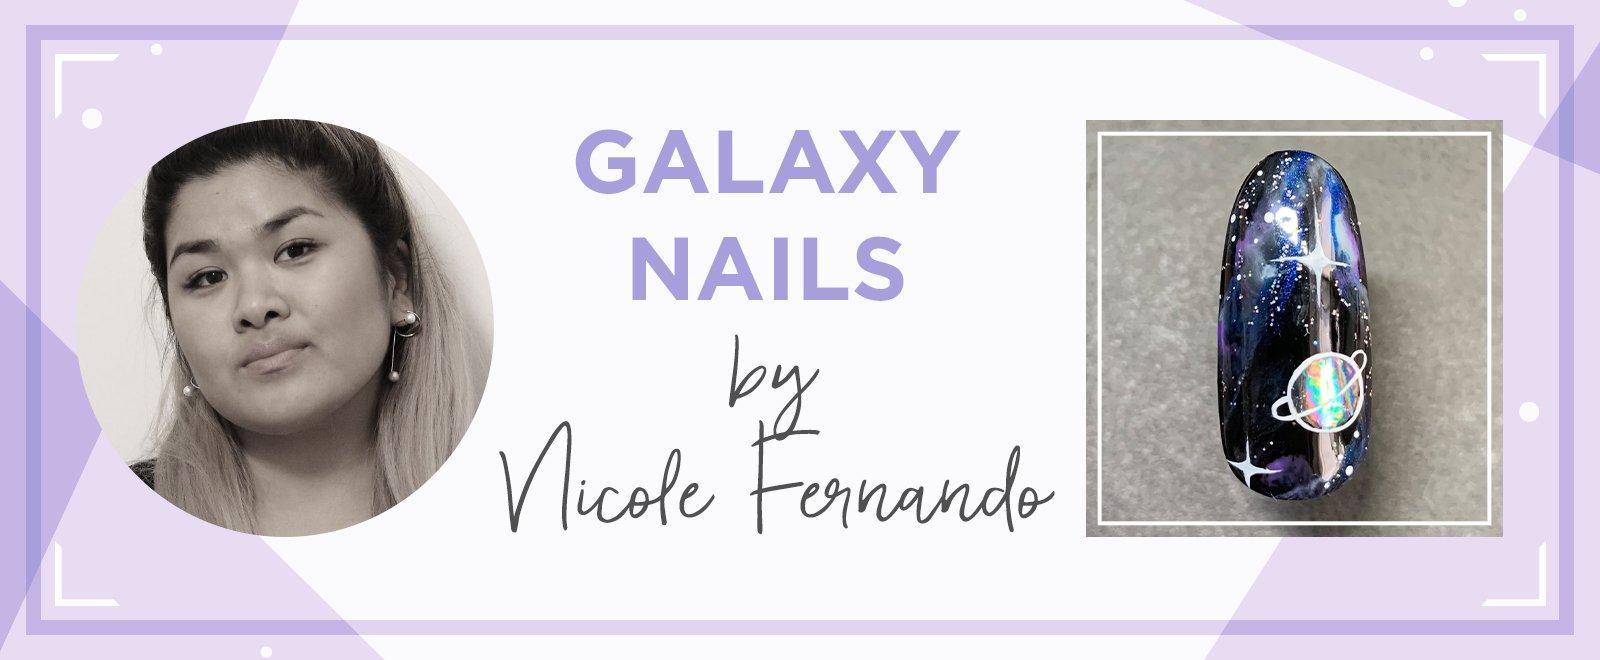 SBS_header_template_1600x660_galaxy-nails_Nicole-Fernando